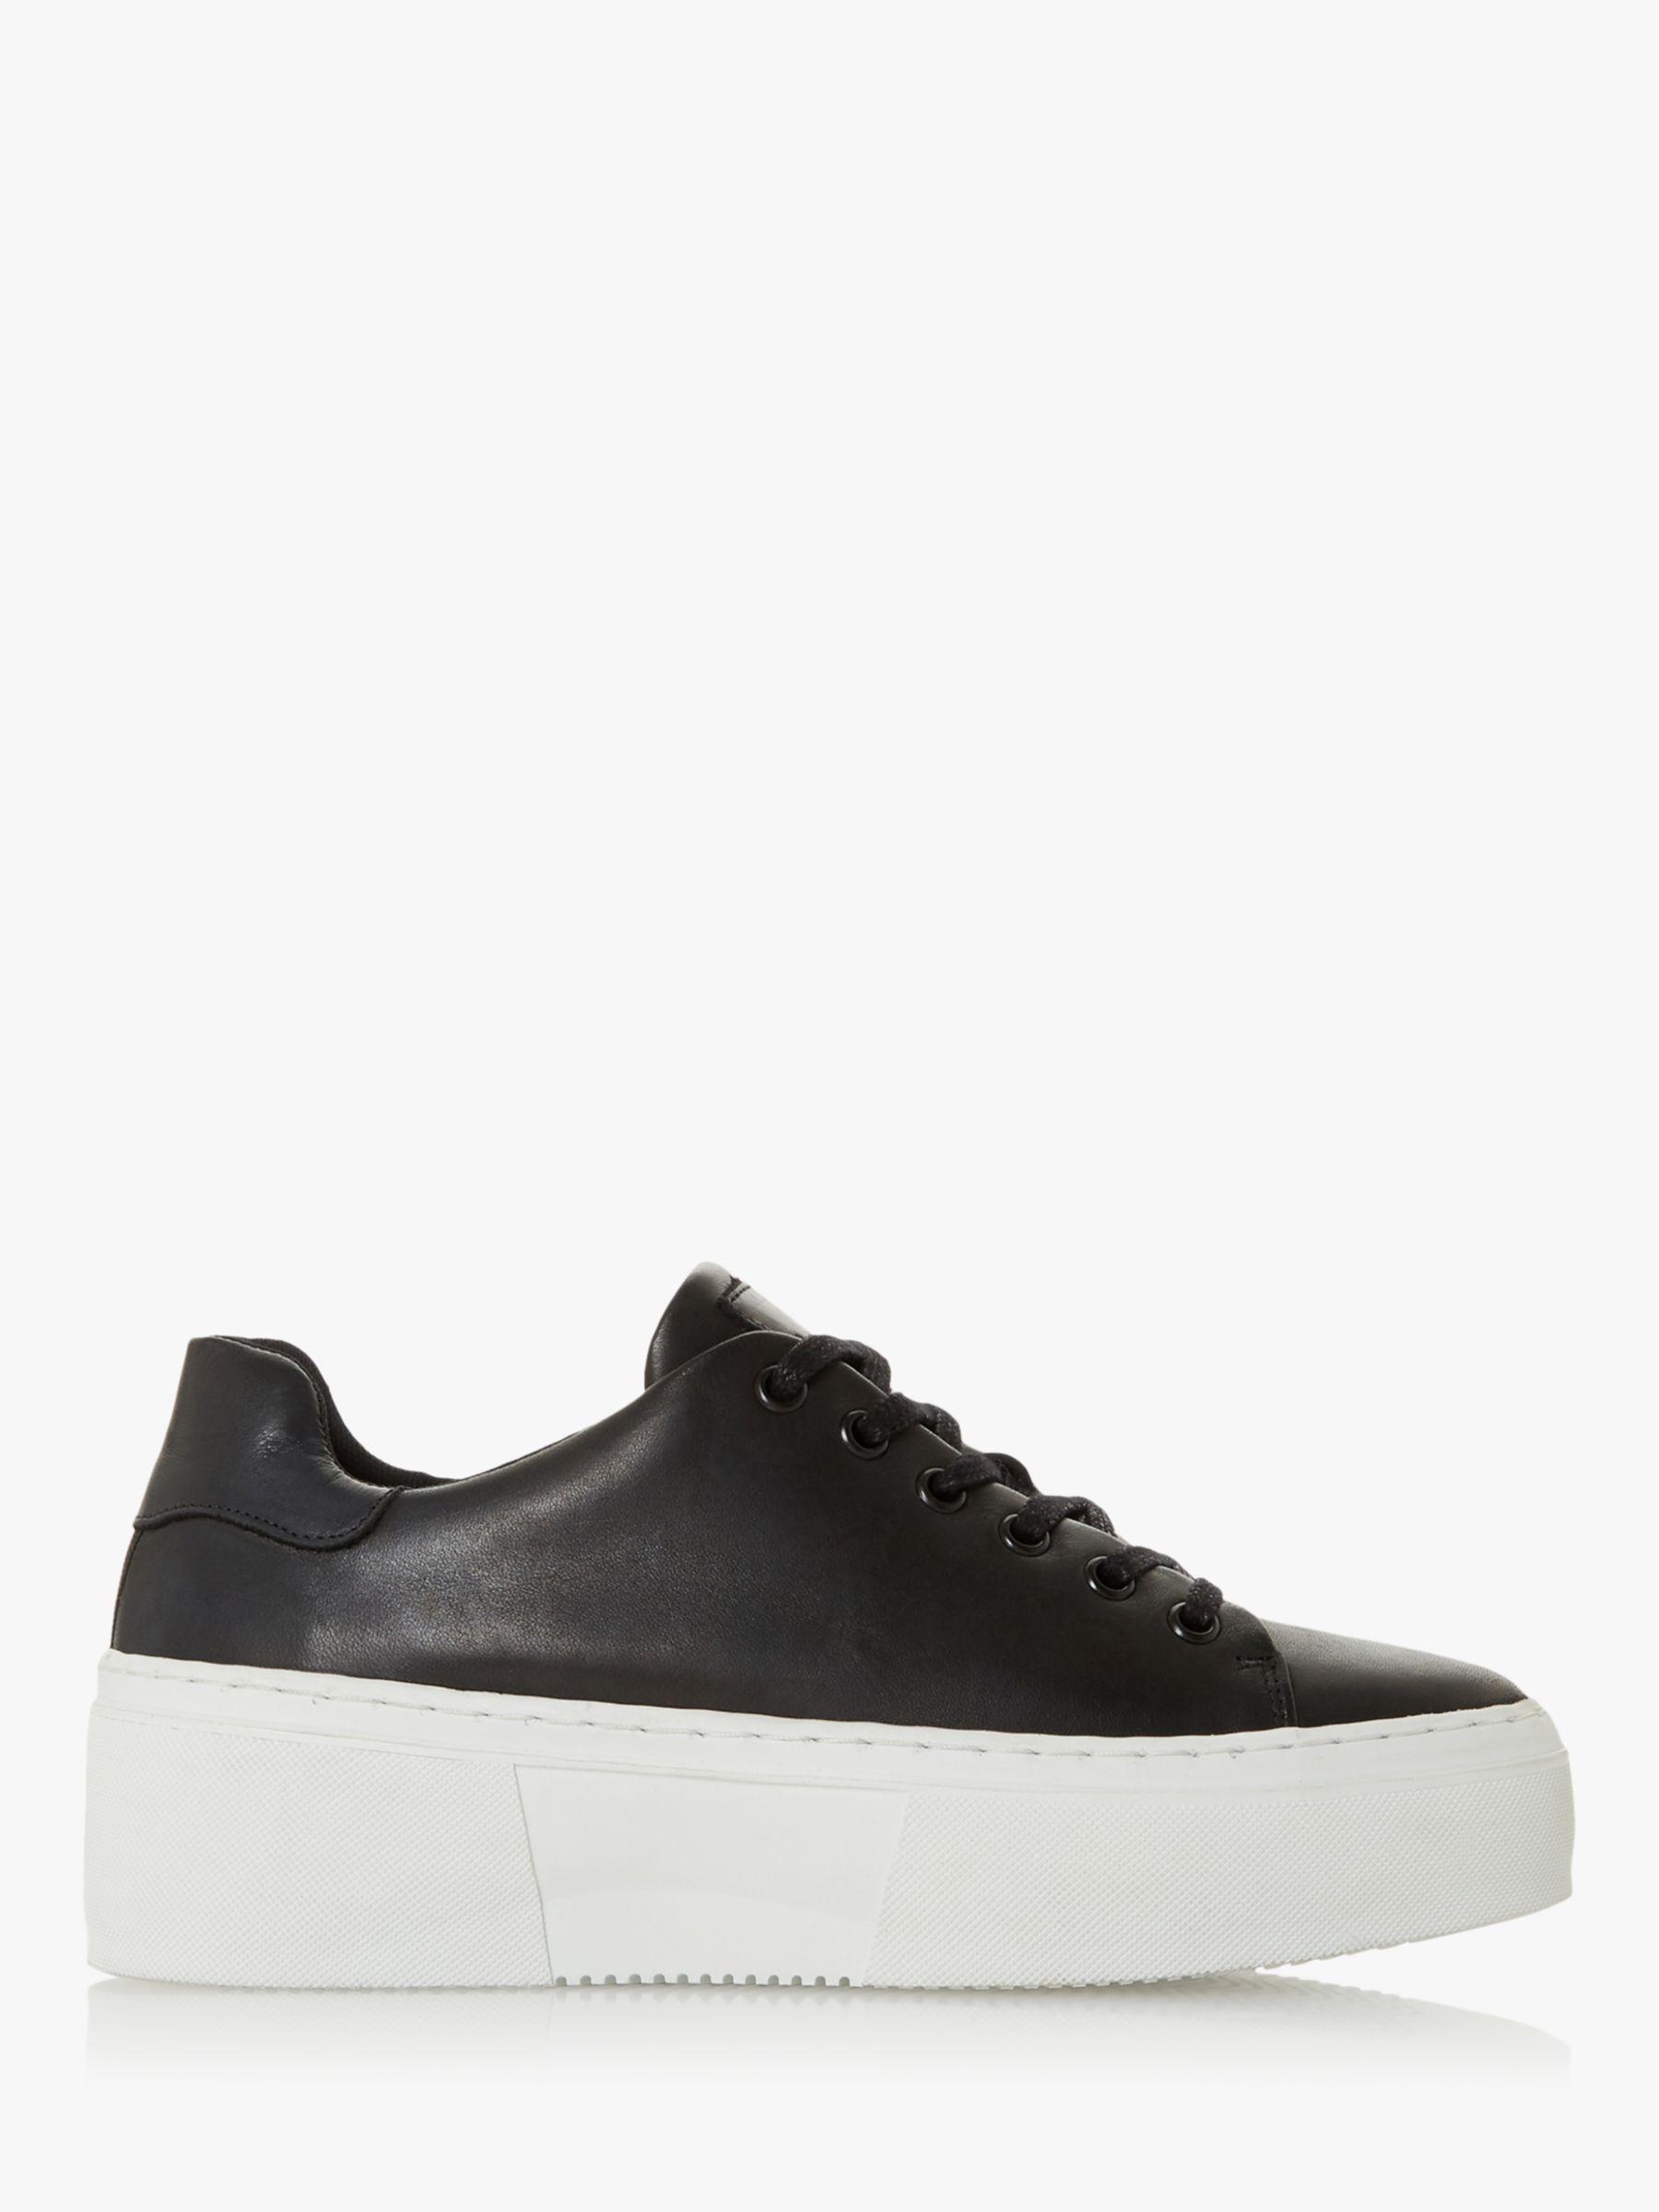 Bertie Bertie Electaa Leather Lace Up Flatform Trainers, Black